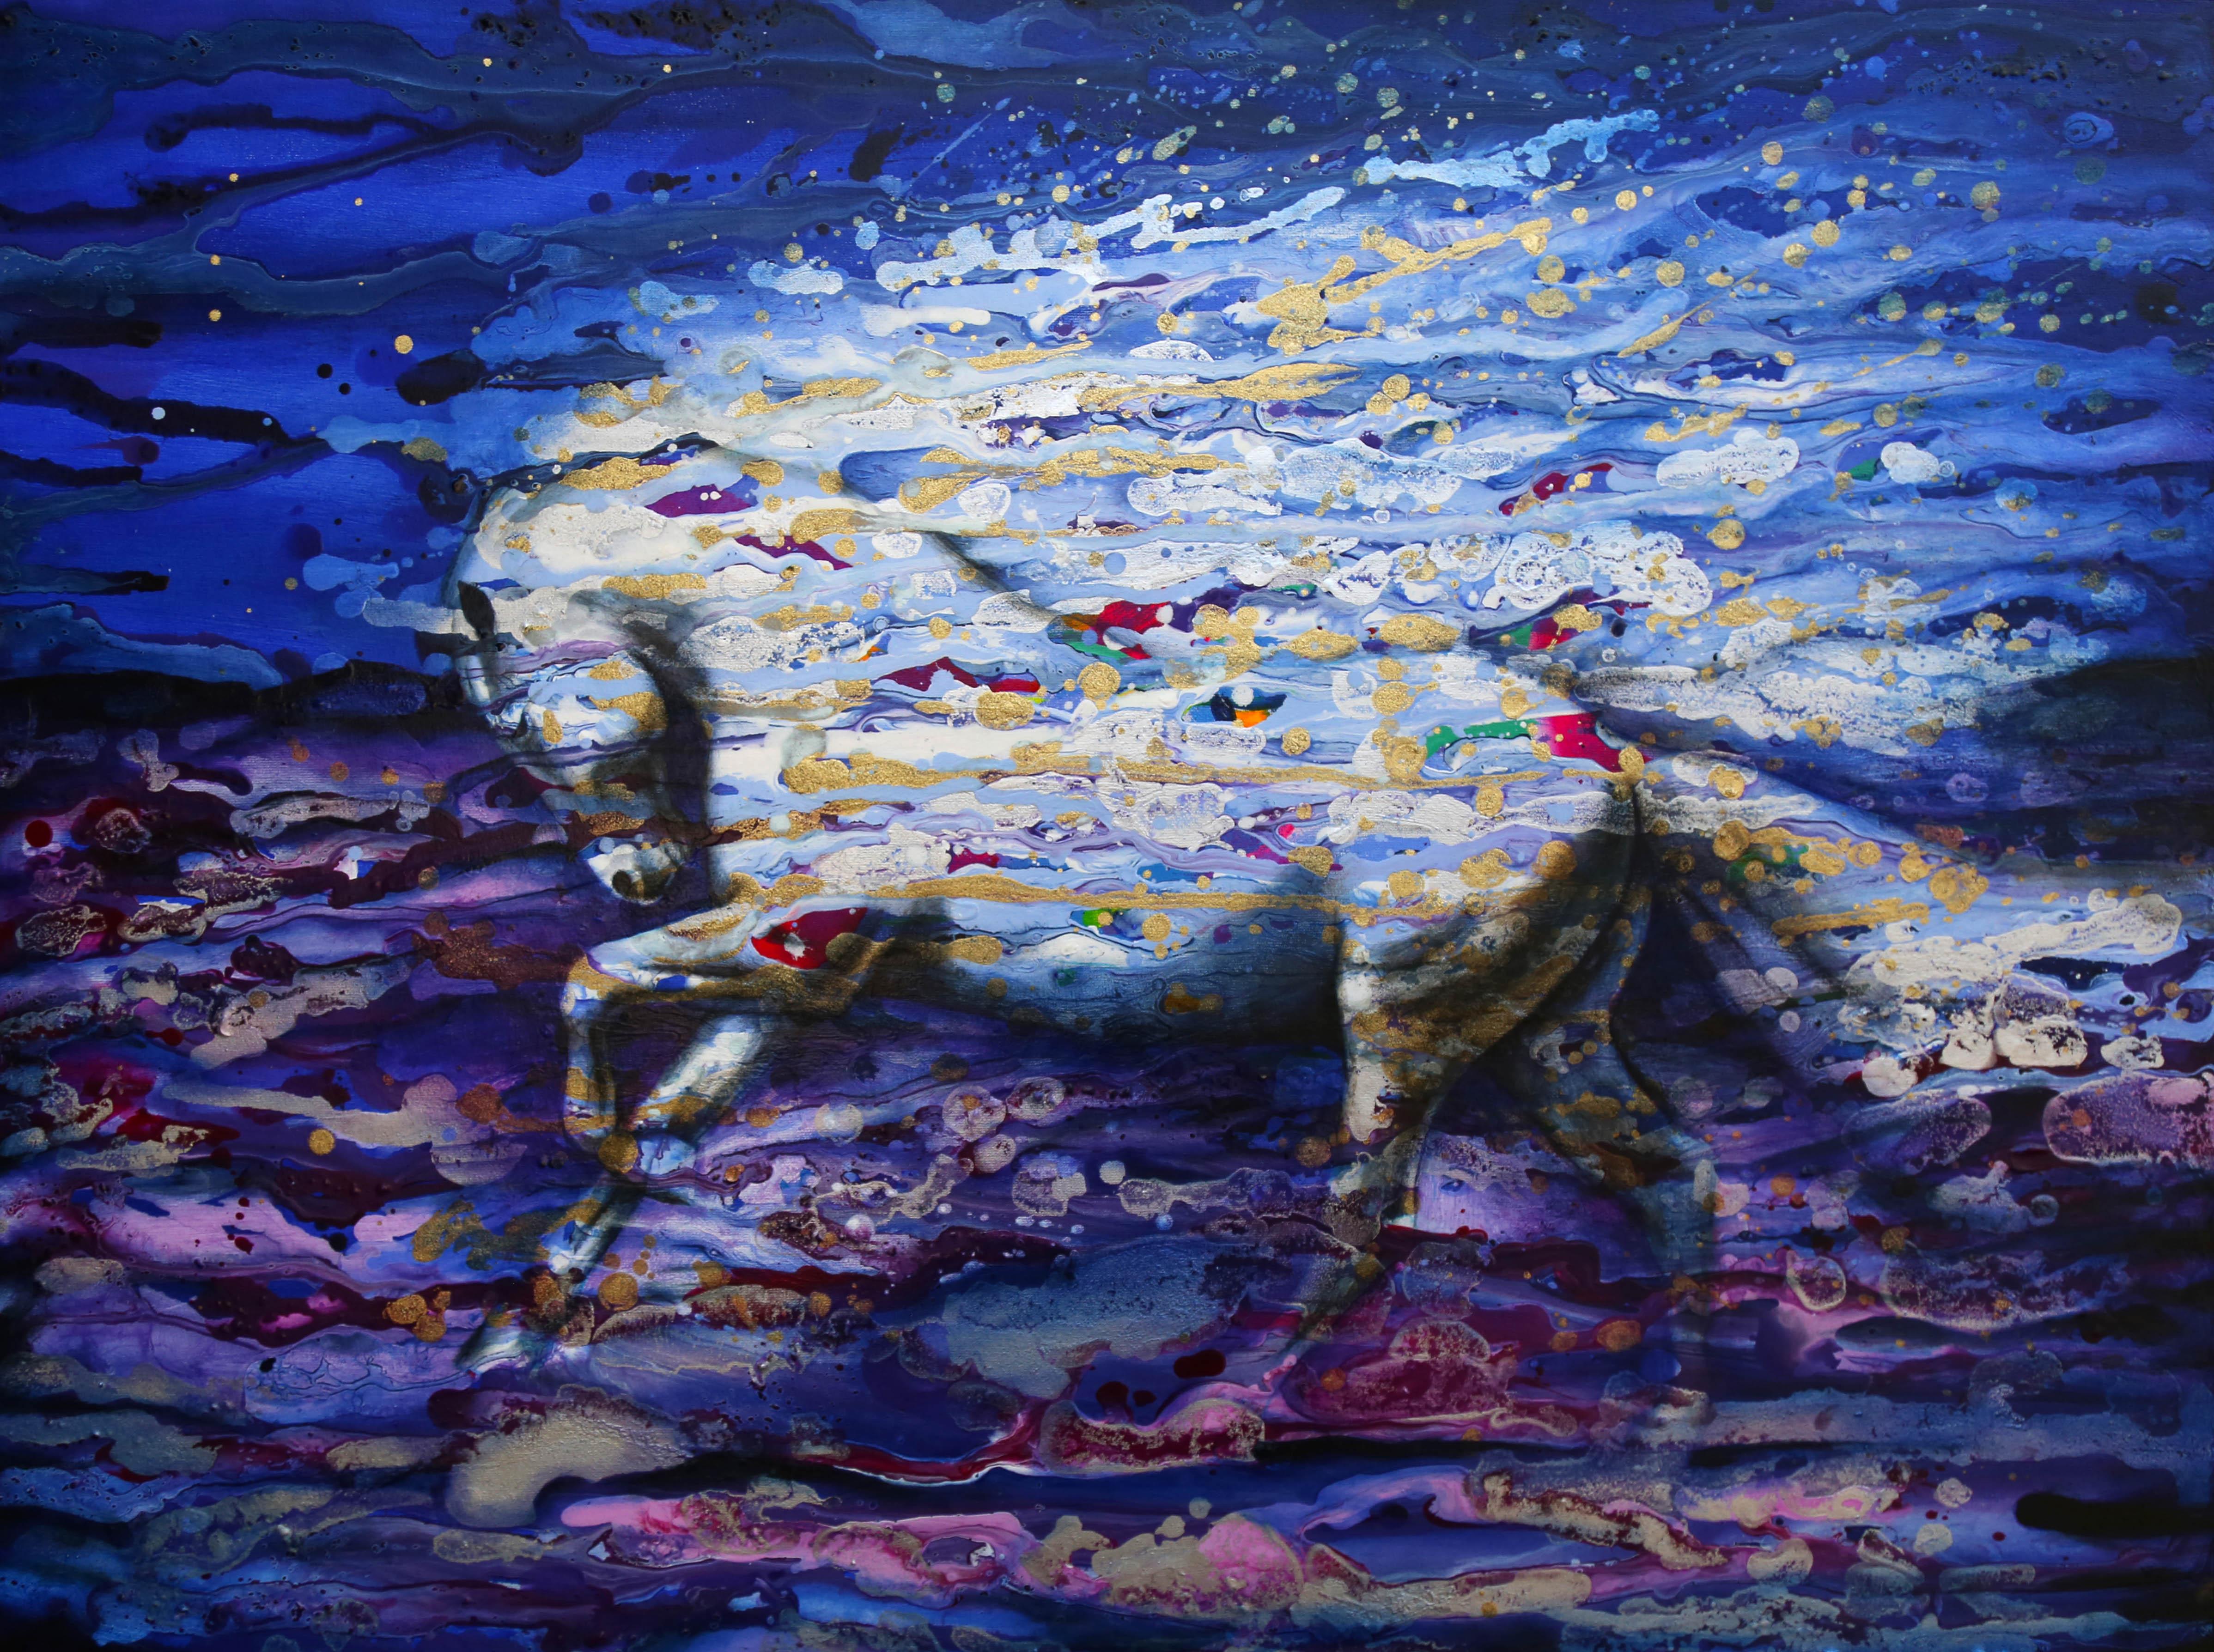 Cavalo da Noite